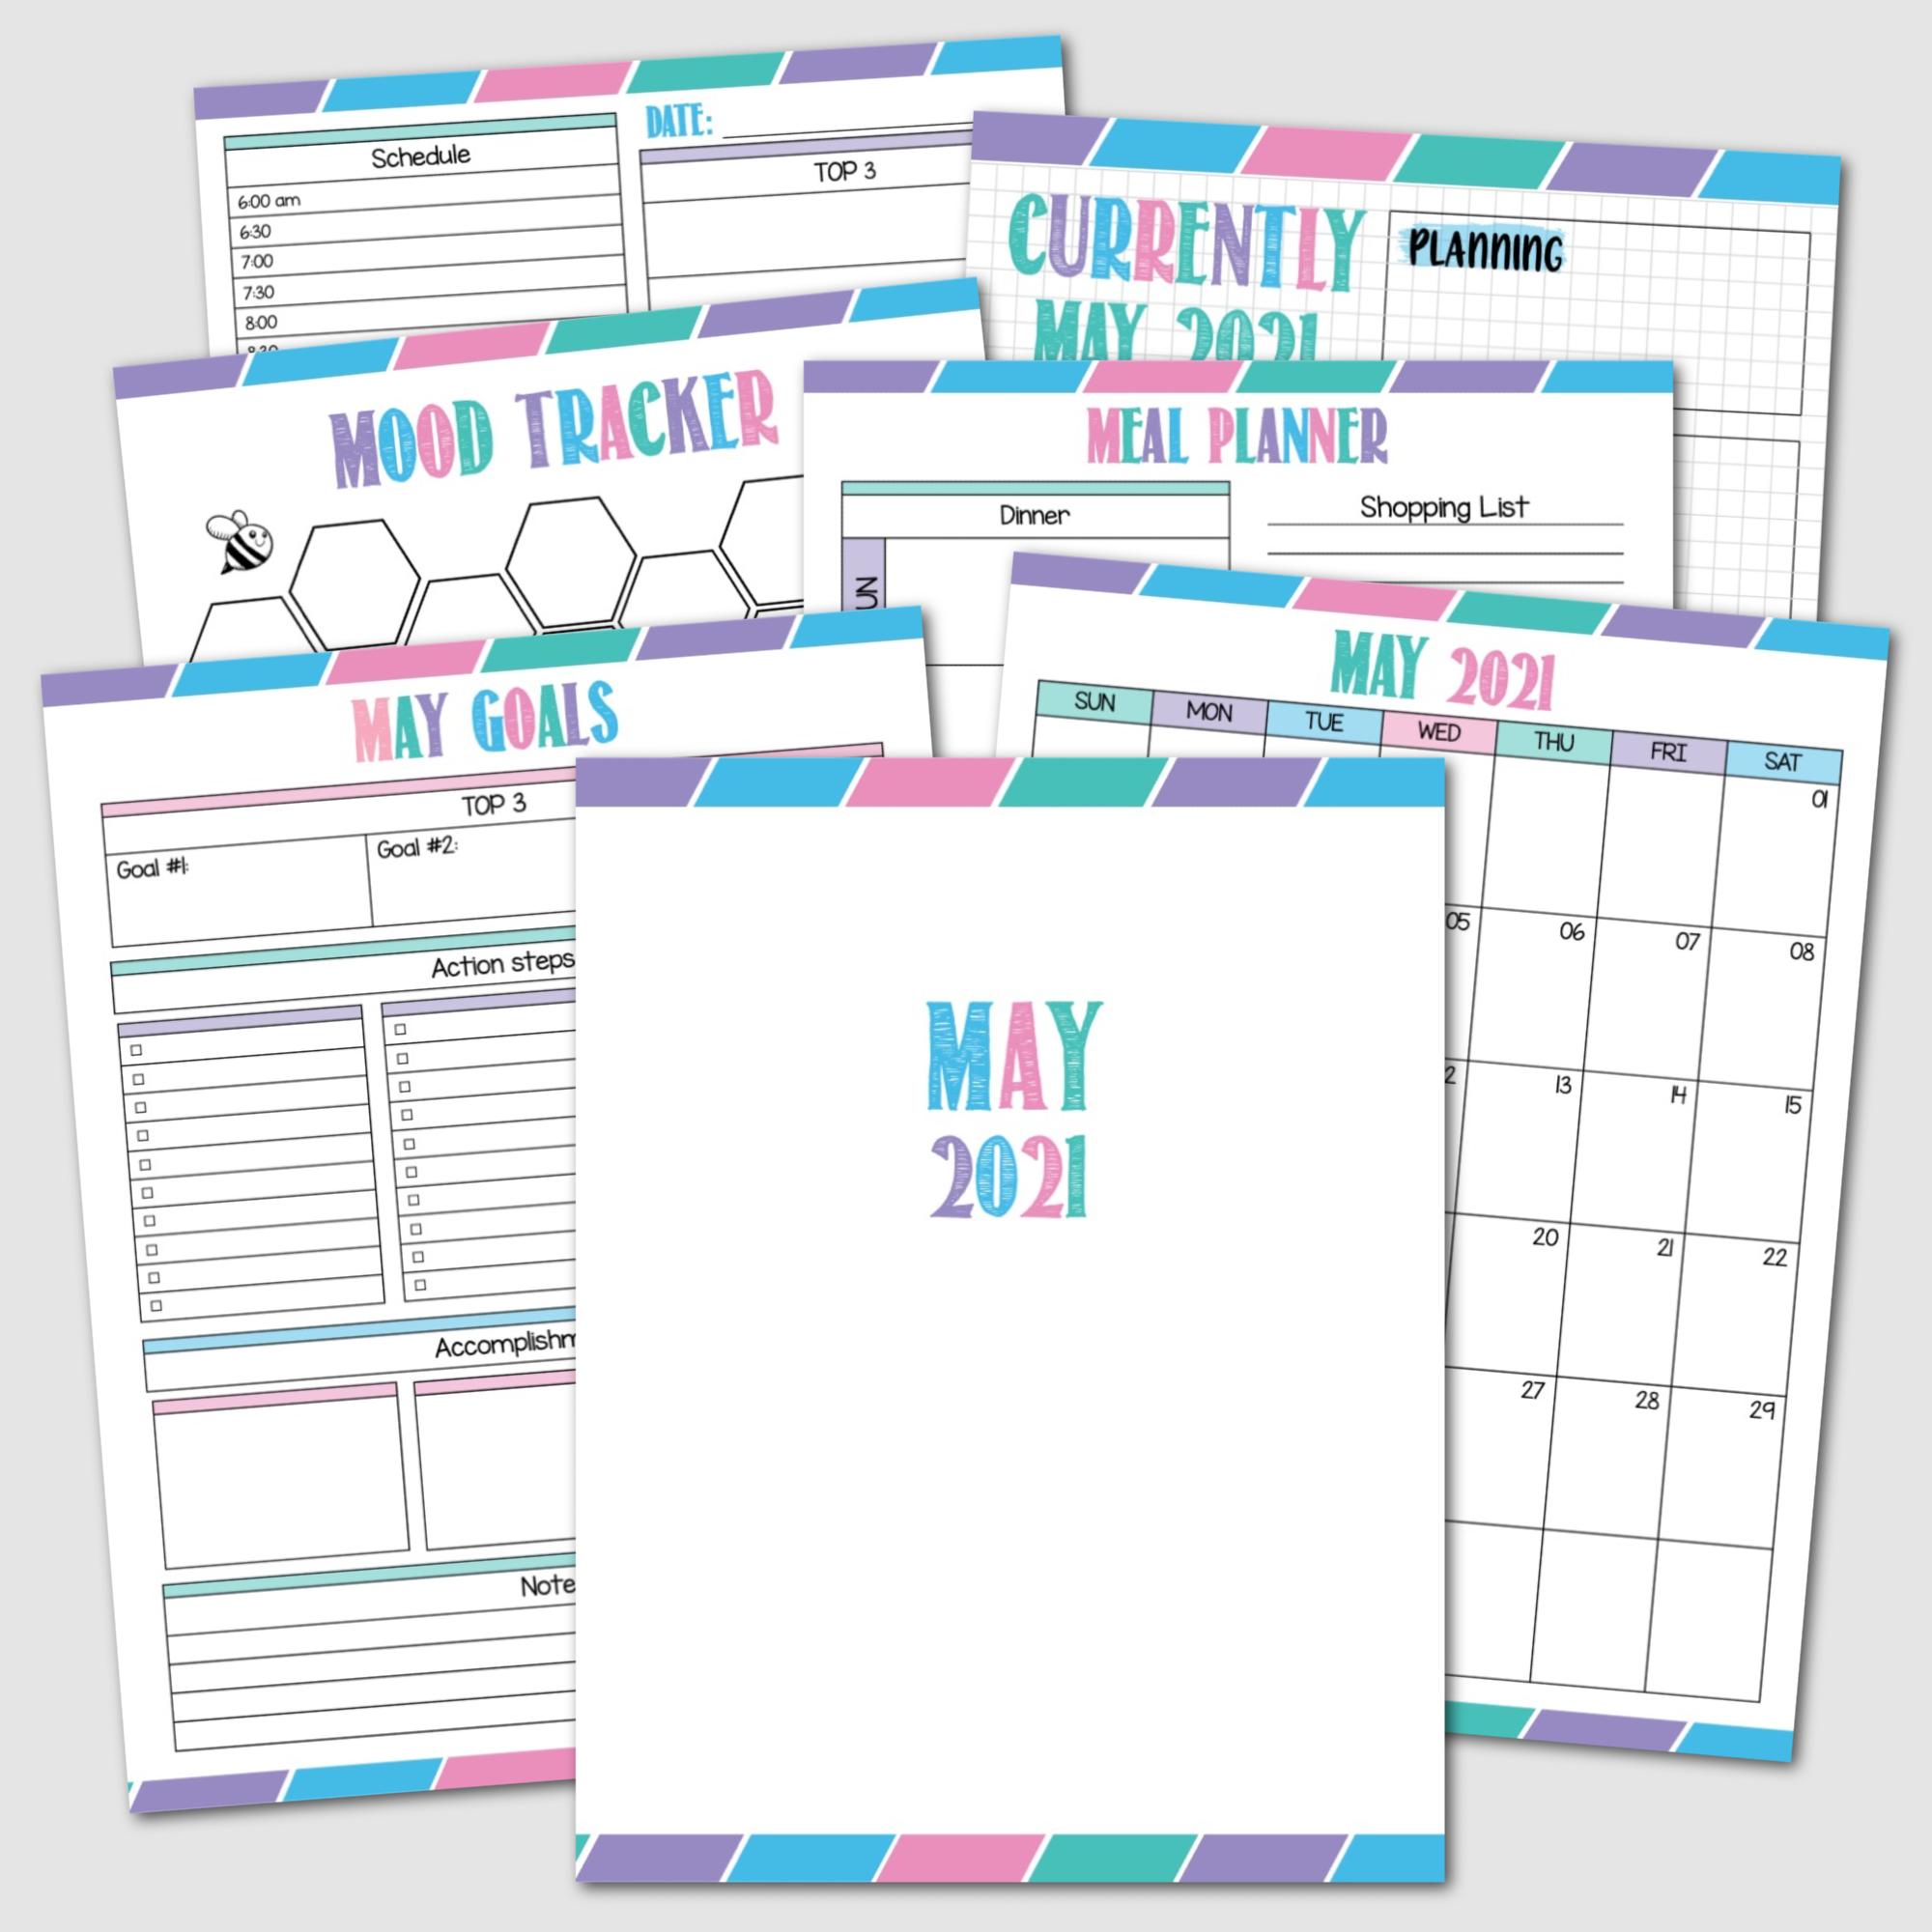 May 2021 Krafty Planner Society Rainbow Edition